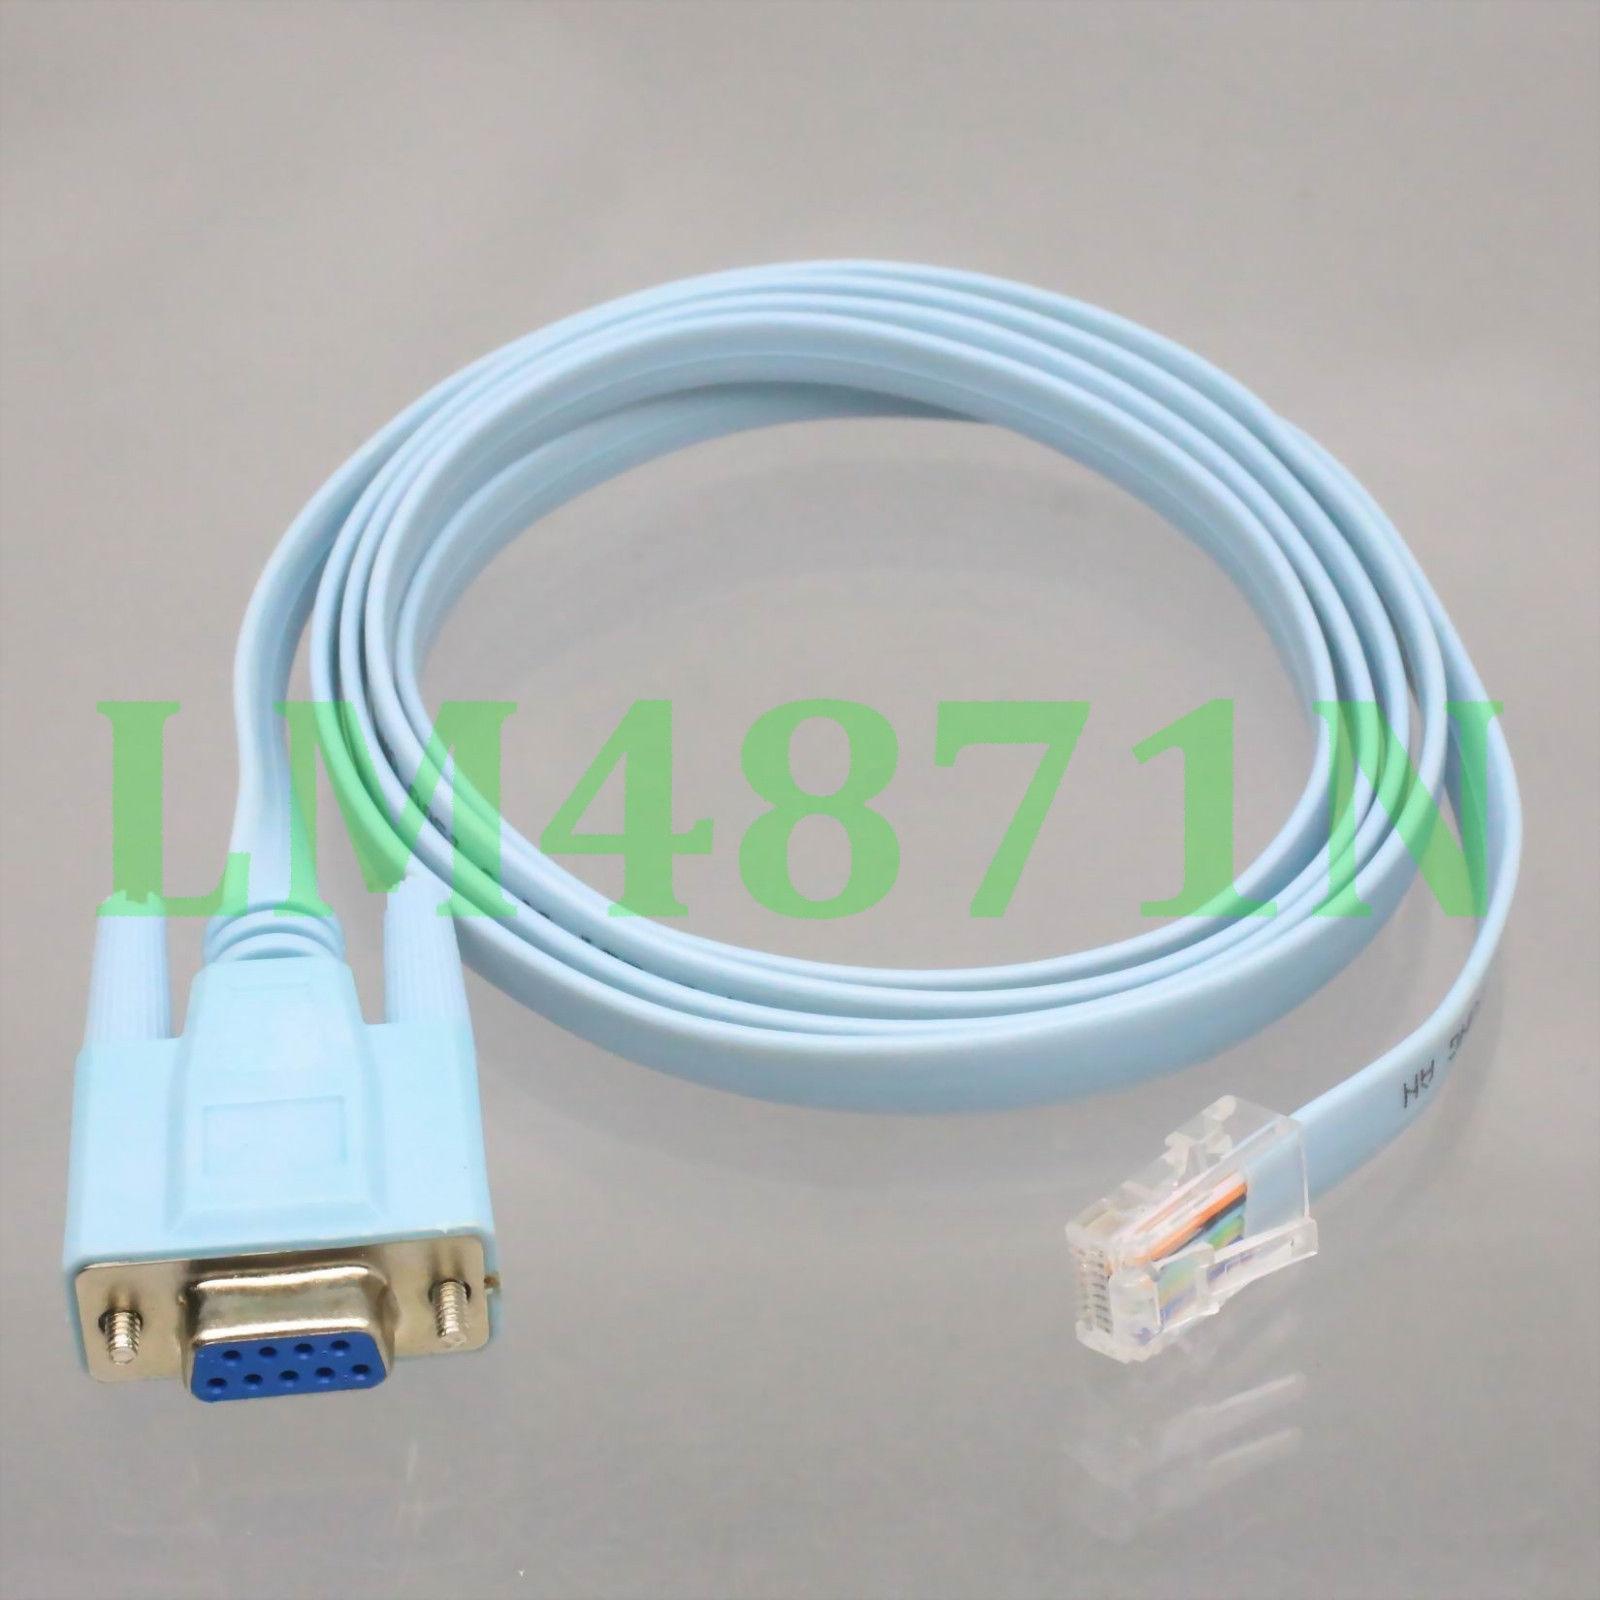 Db9 D Sub Vga Female Jack To Rj45 8p8c Plug Male Cisco Console Cable 5ft Blue Ebay Electronics Ebay Plugs Console